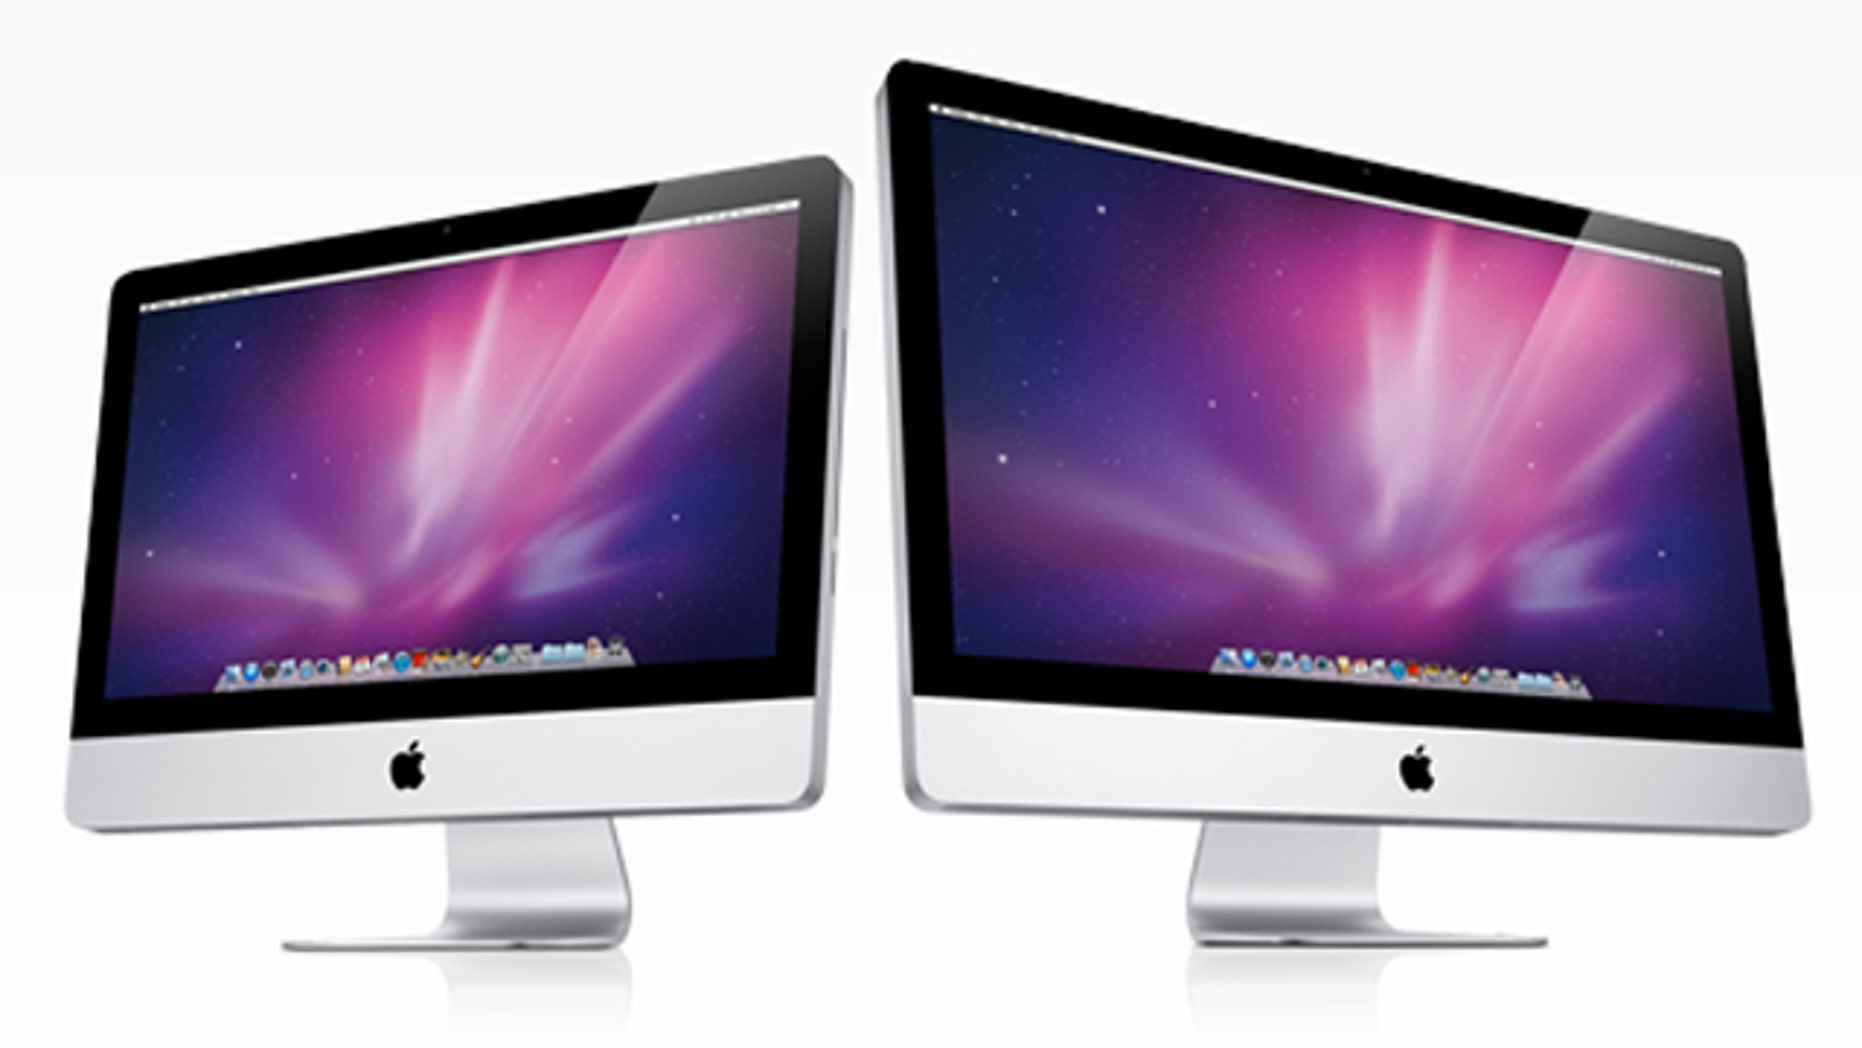 The new Apple iMac